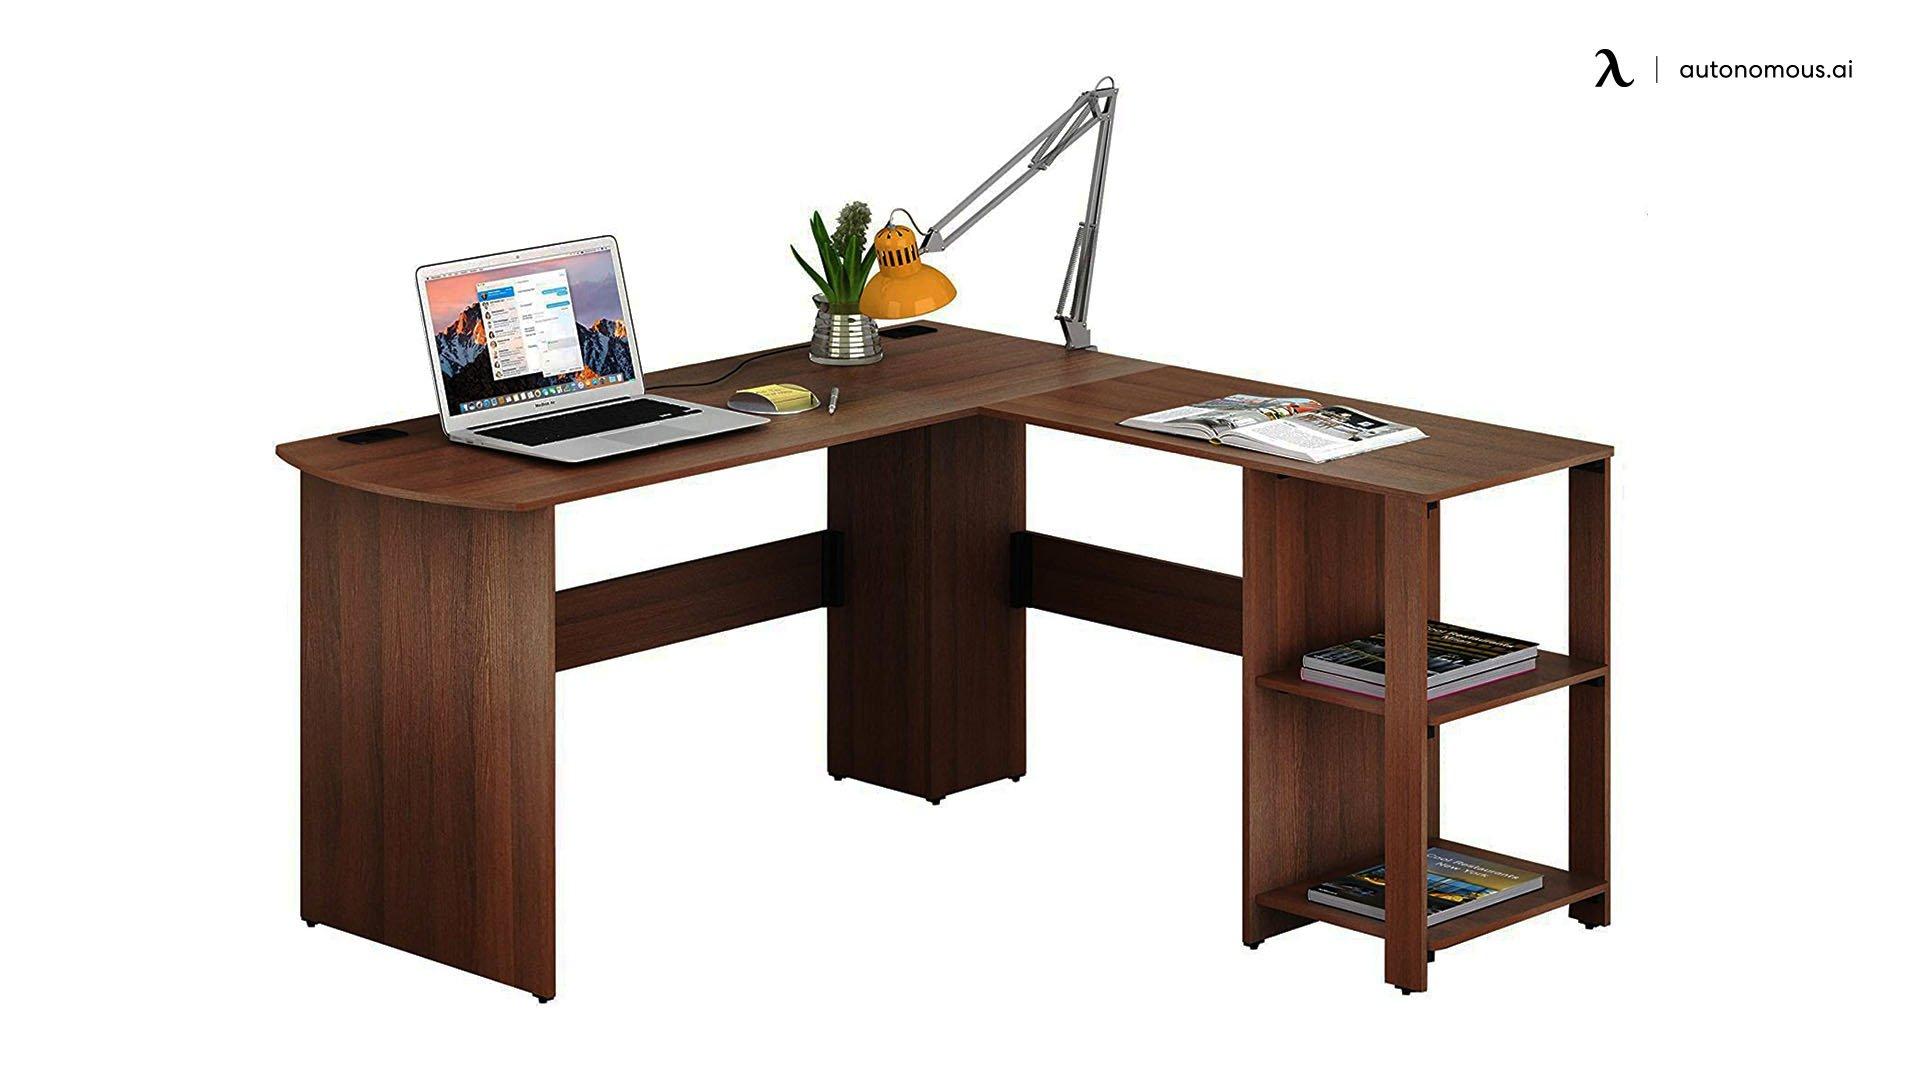 The SHW L-Shaped Home Office Wood Corner Desk